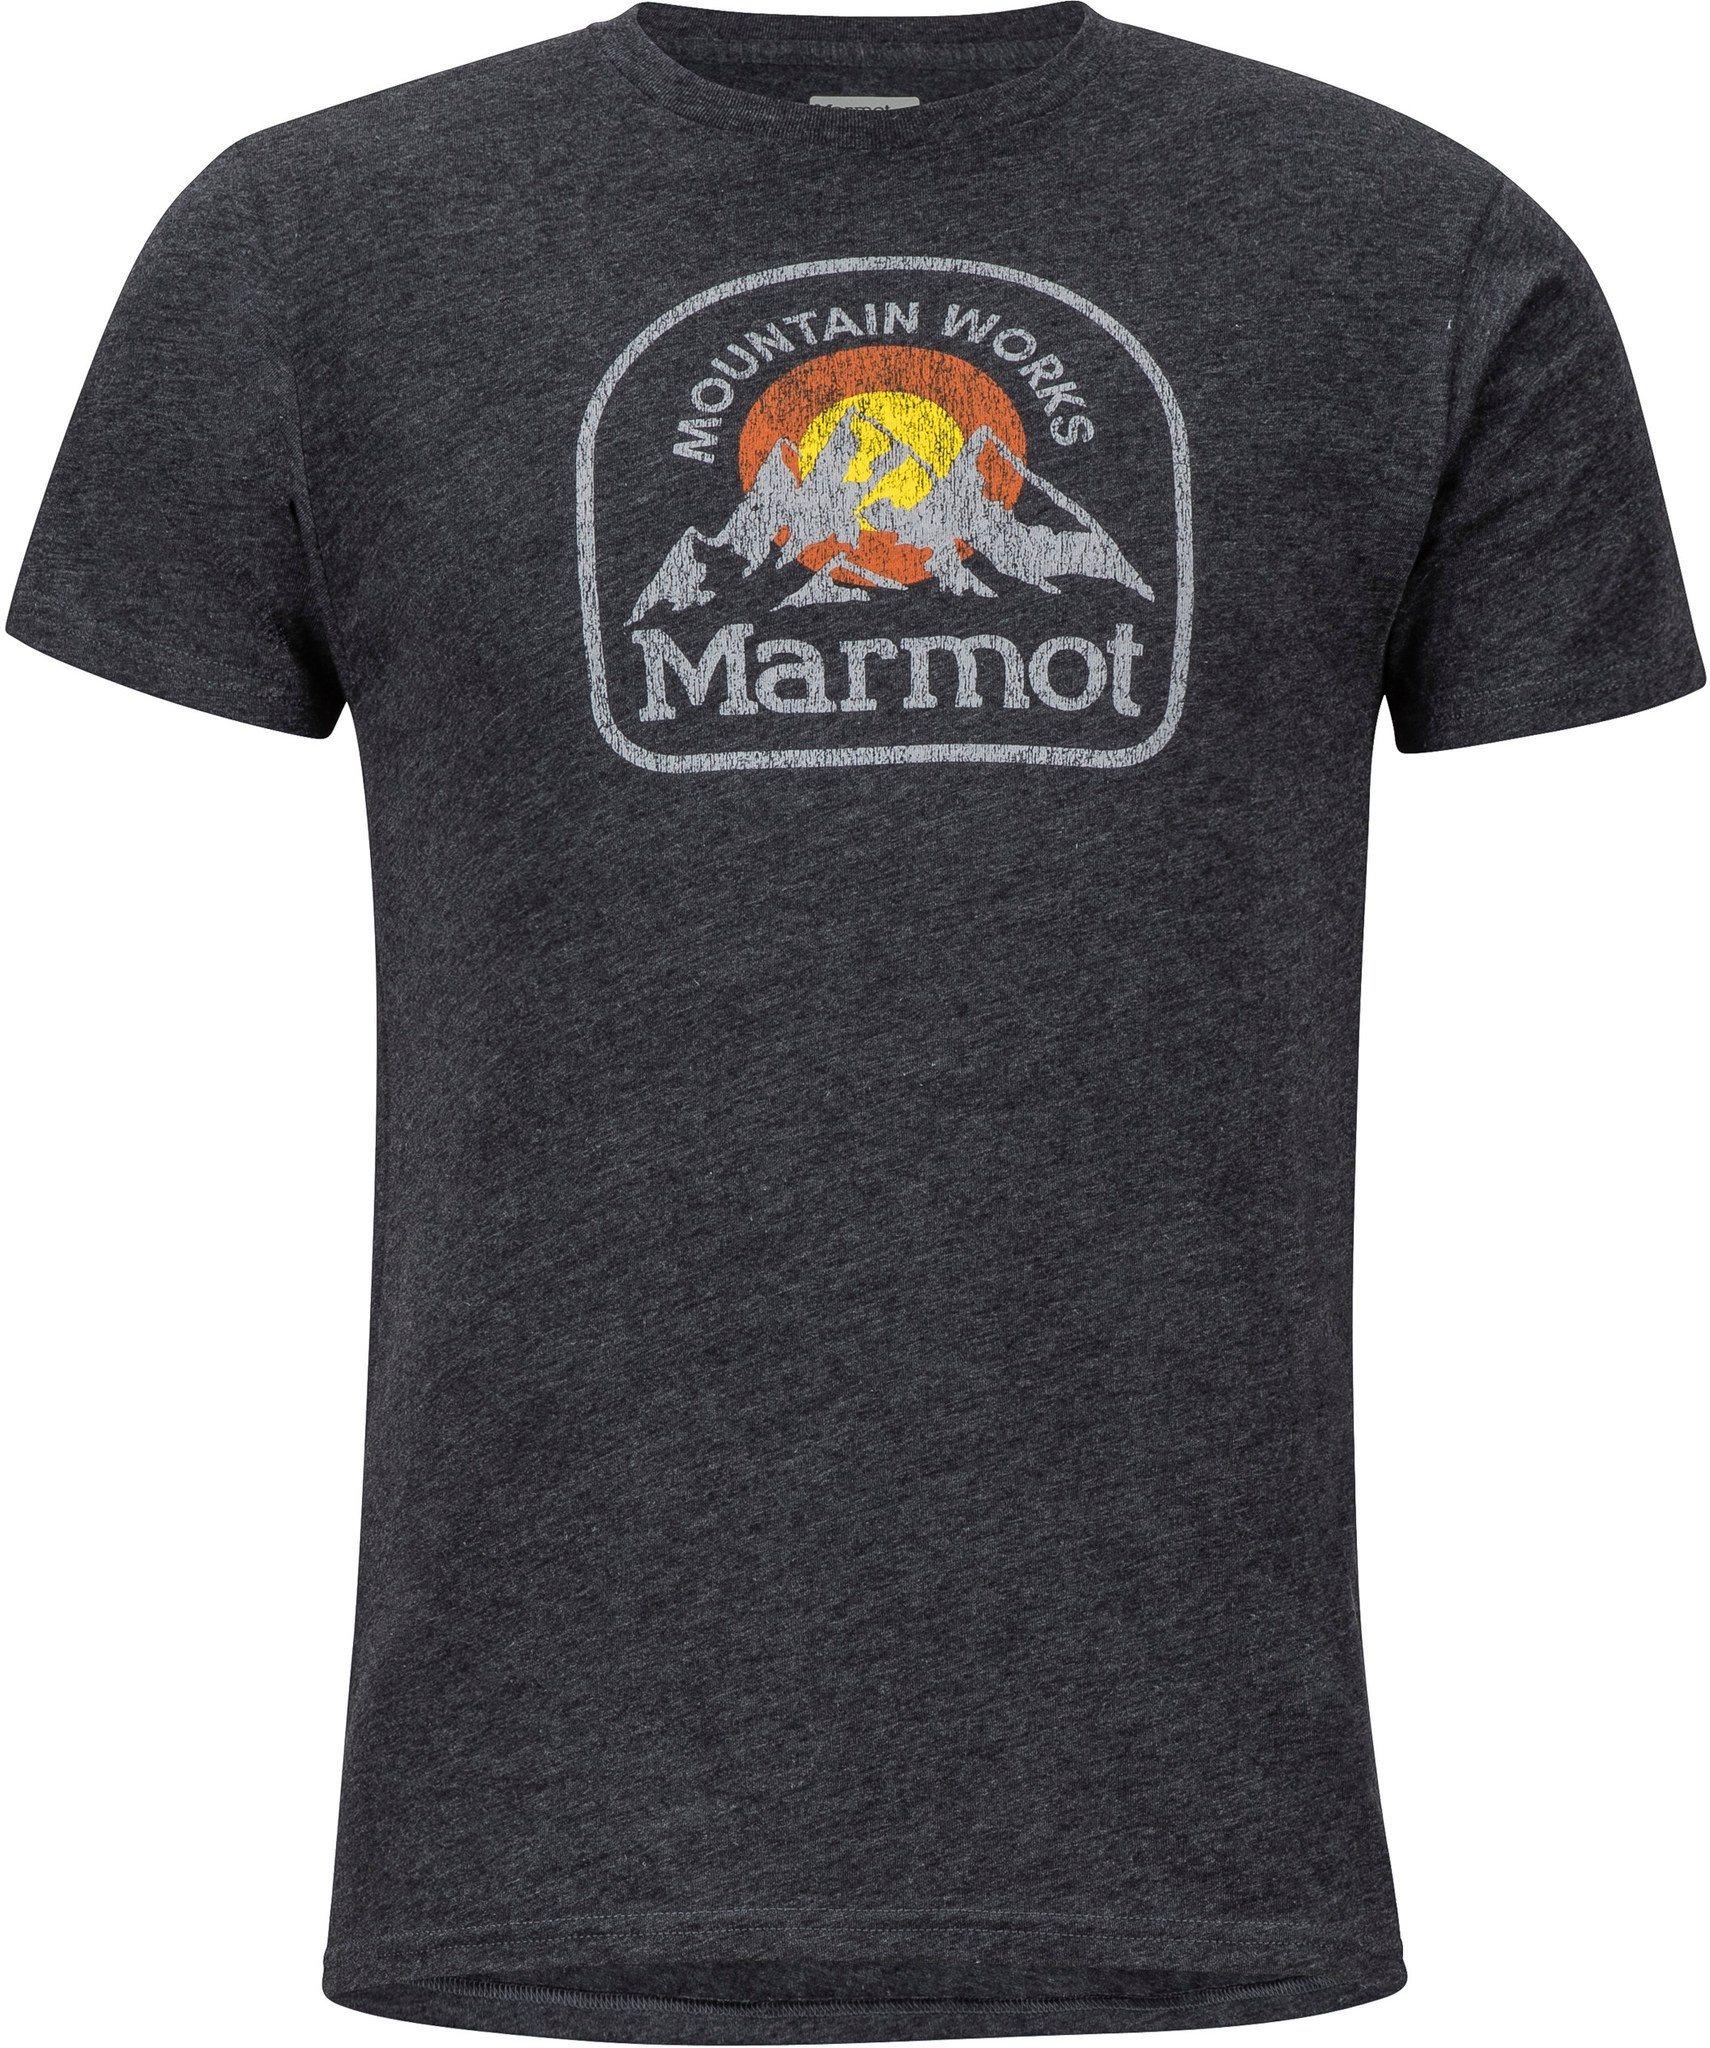 Marmot T-Shirt »Altitude SS Tee Men« | Bekleidung > Shirts > Sonstige Shirts | Pet - Baumwolle | Marmot